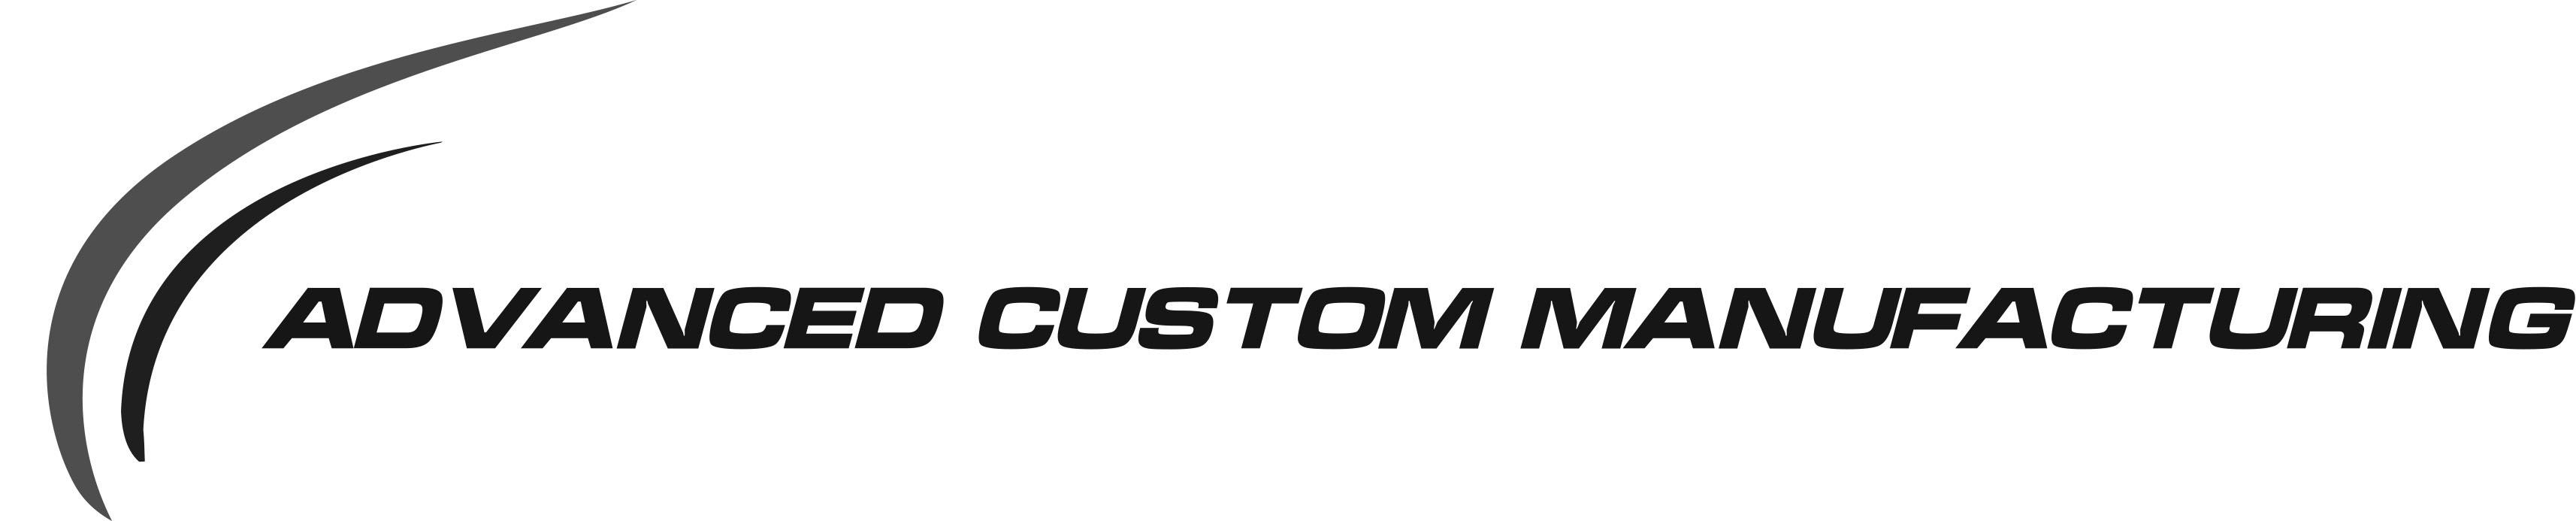 Advanced Custom Manufacturing